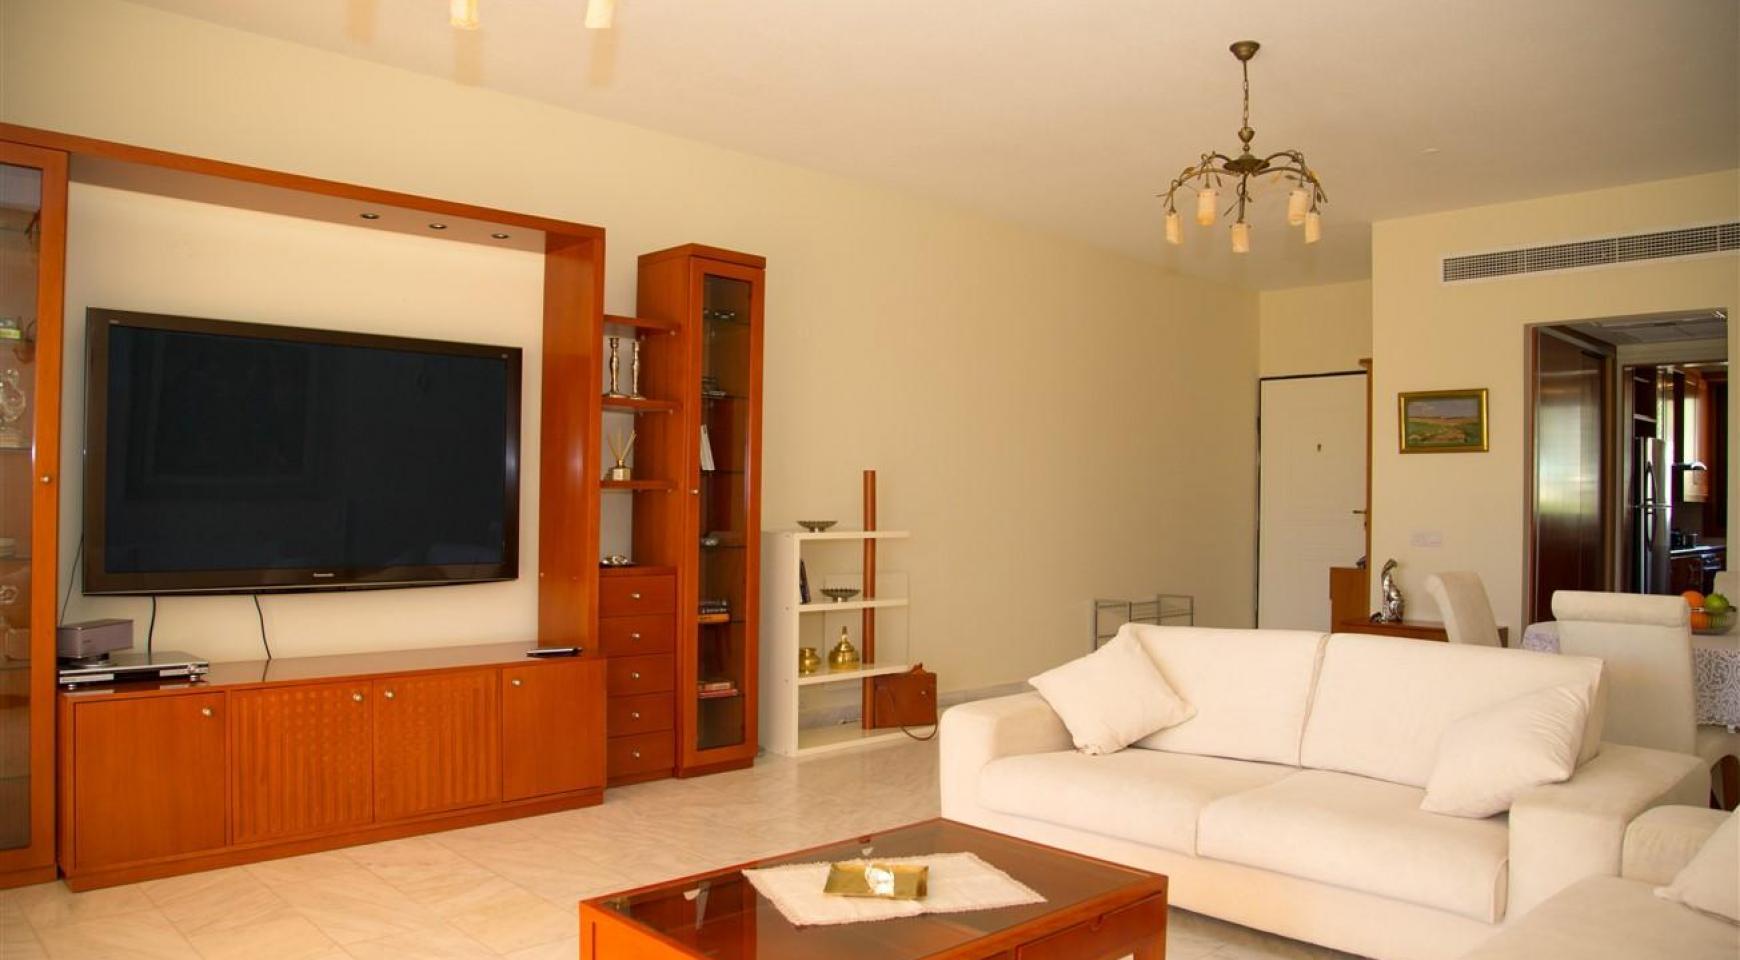 3-Спальная Квартира на Берегу Моря в Комплексе Thera   - 34